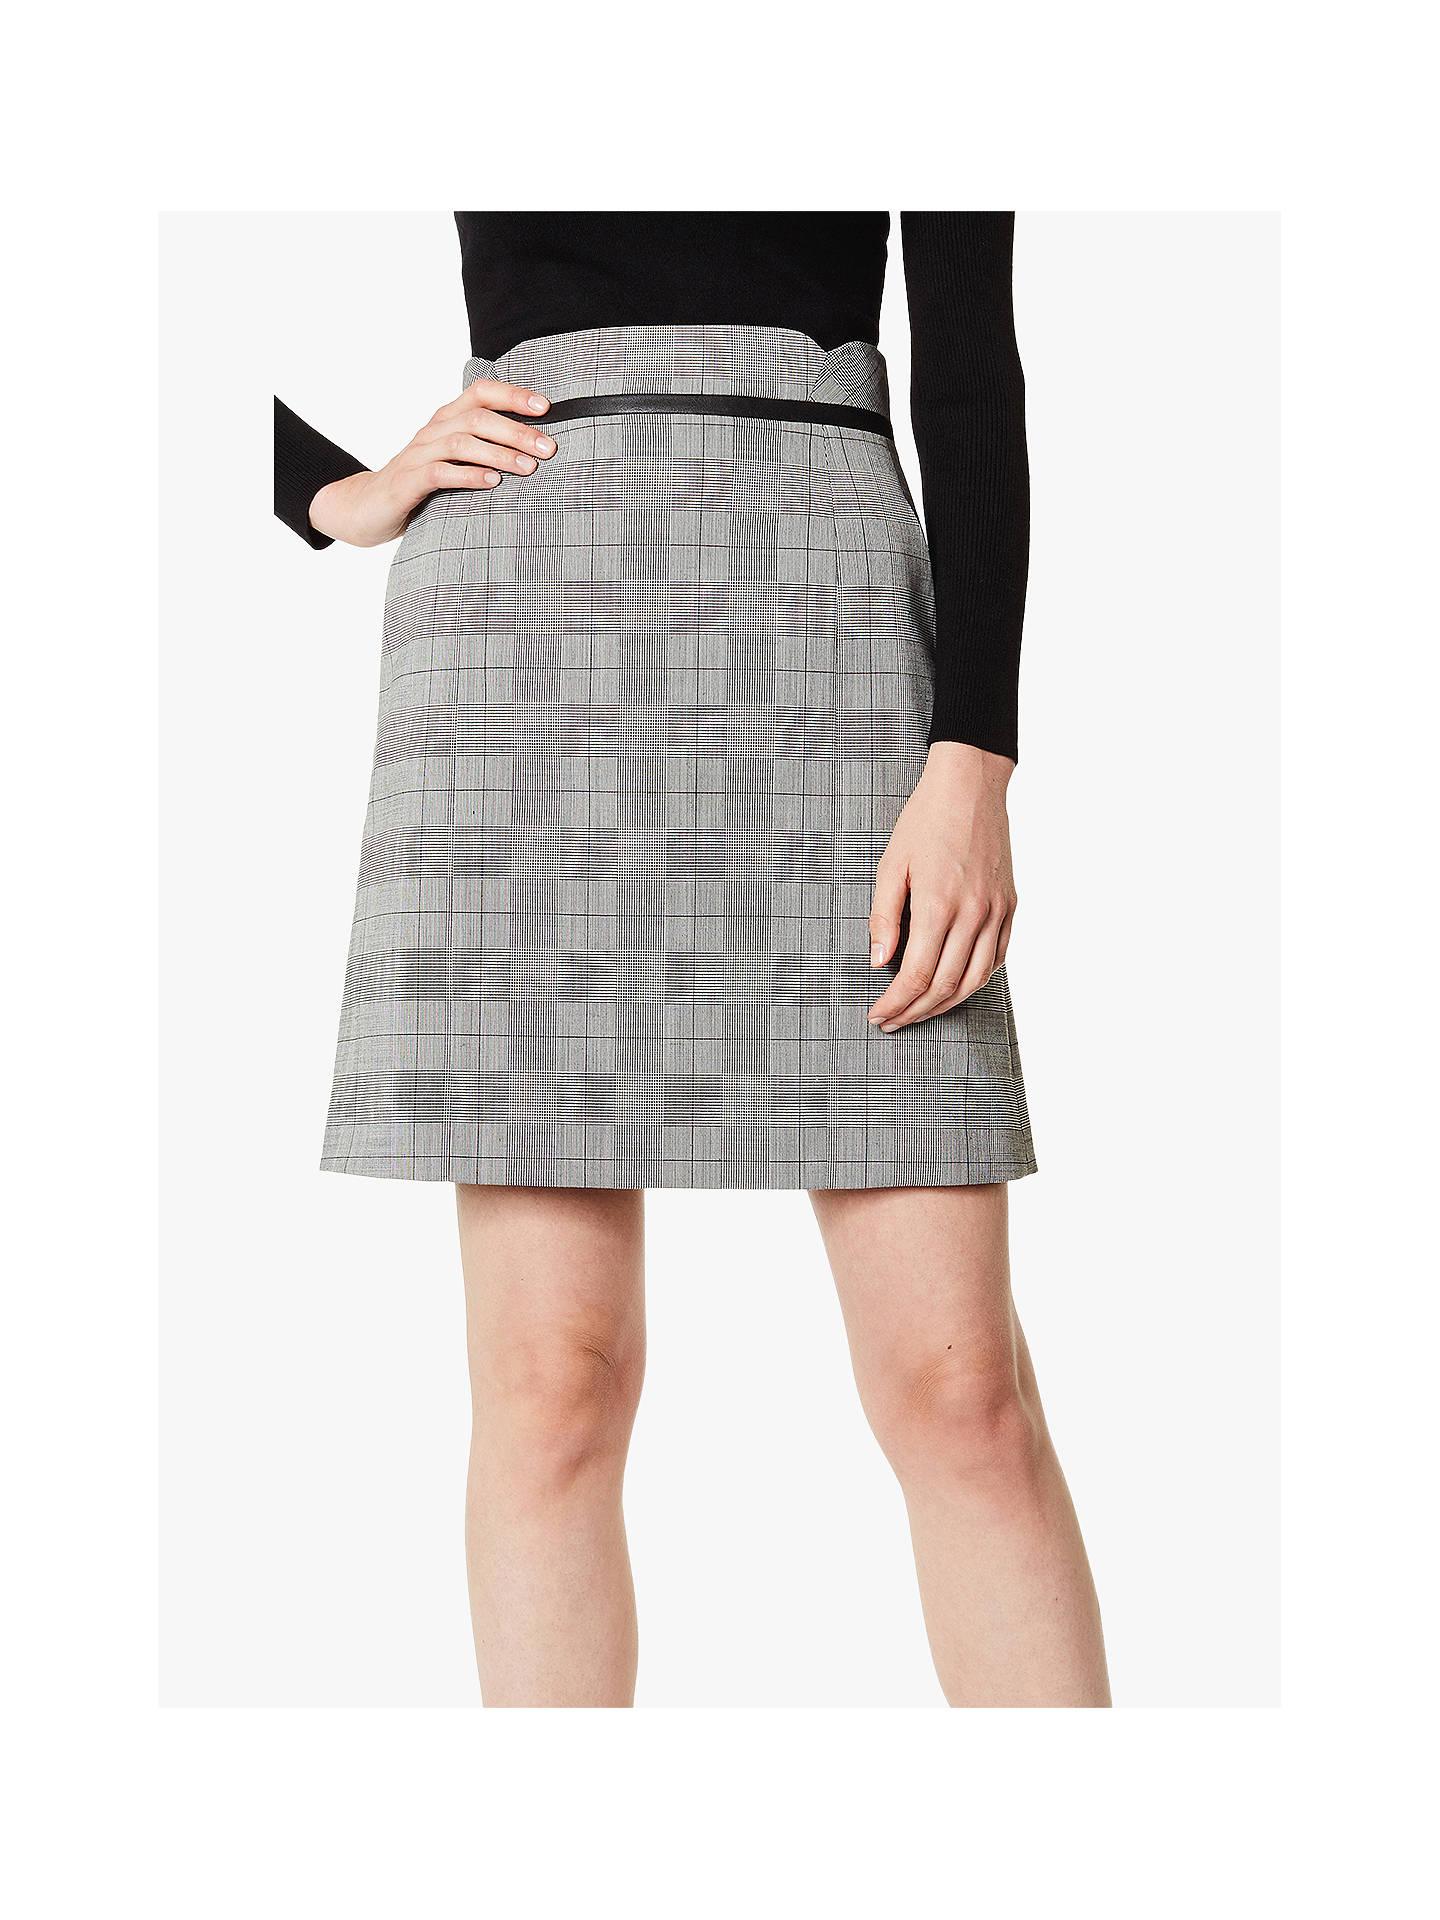 9225eb2a1 Buy Karen Millen Checked Mini Skirt, Grey/Multi, 6 Online at johnlewis.